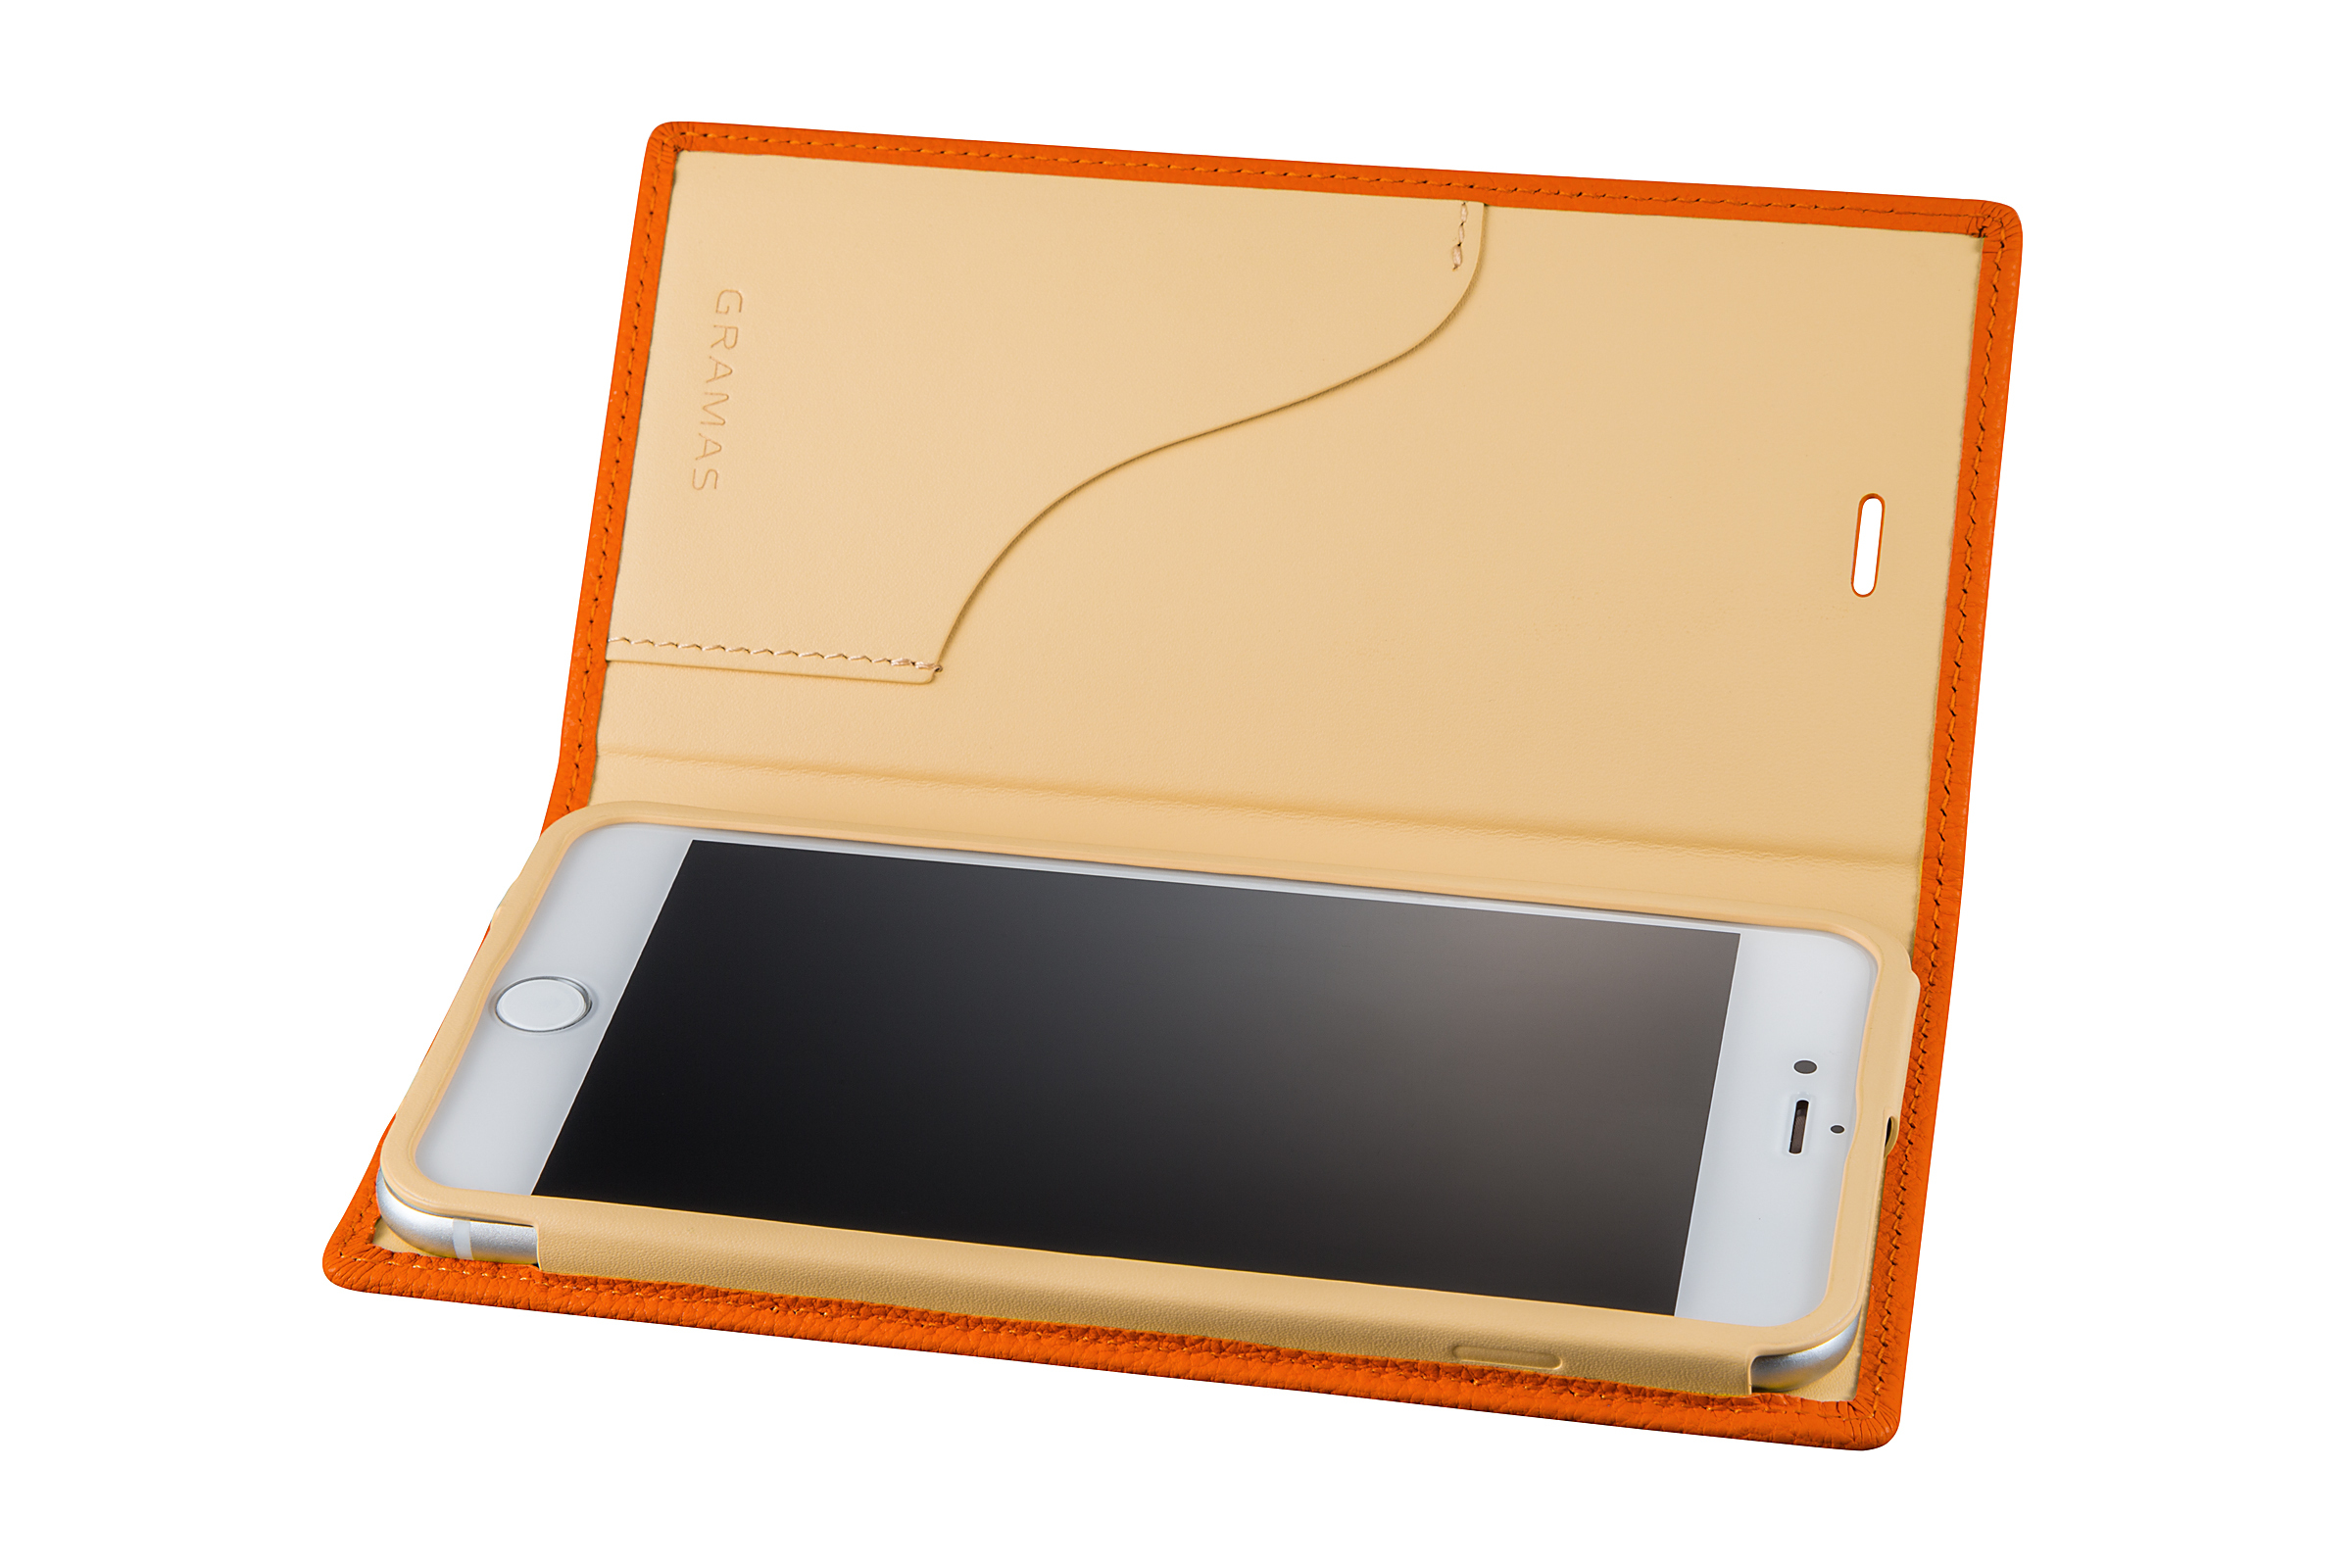 GRAMAS Shrunken-calf Full Leather Case for iPhone 7 Plus(Orange) シュランケンカーフ 手帳型フルレザーケース - 画像3